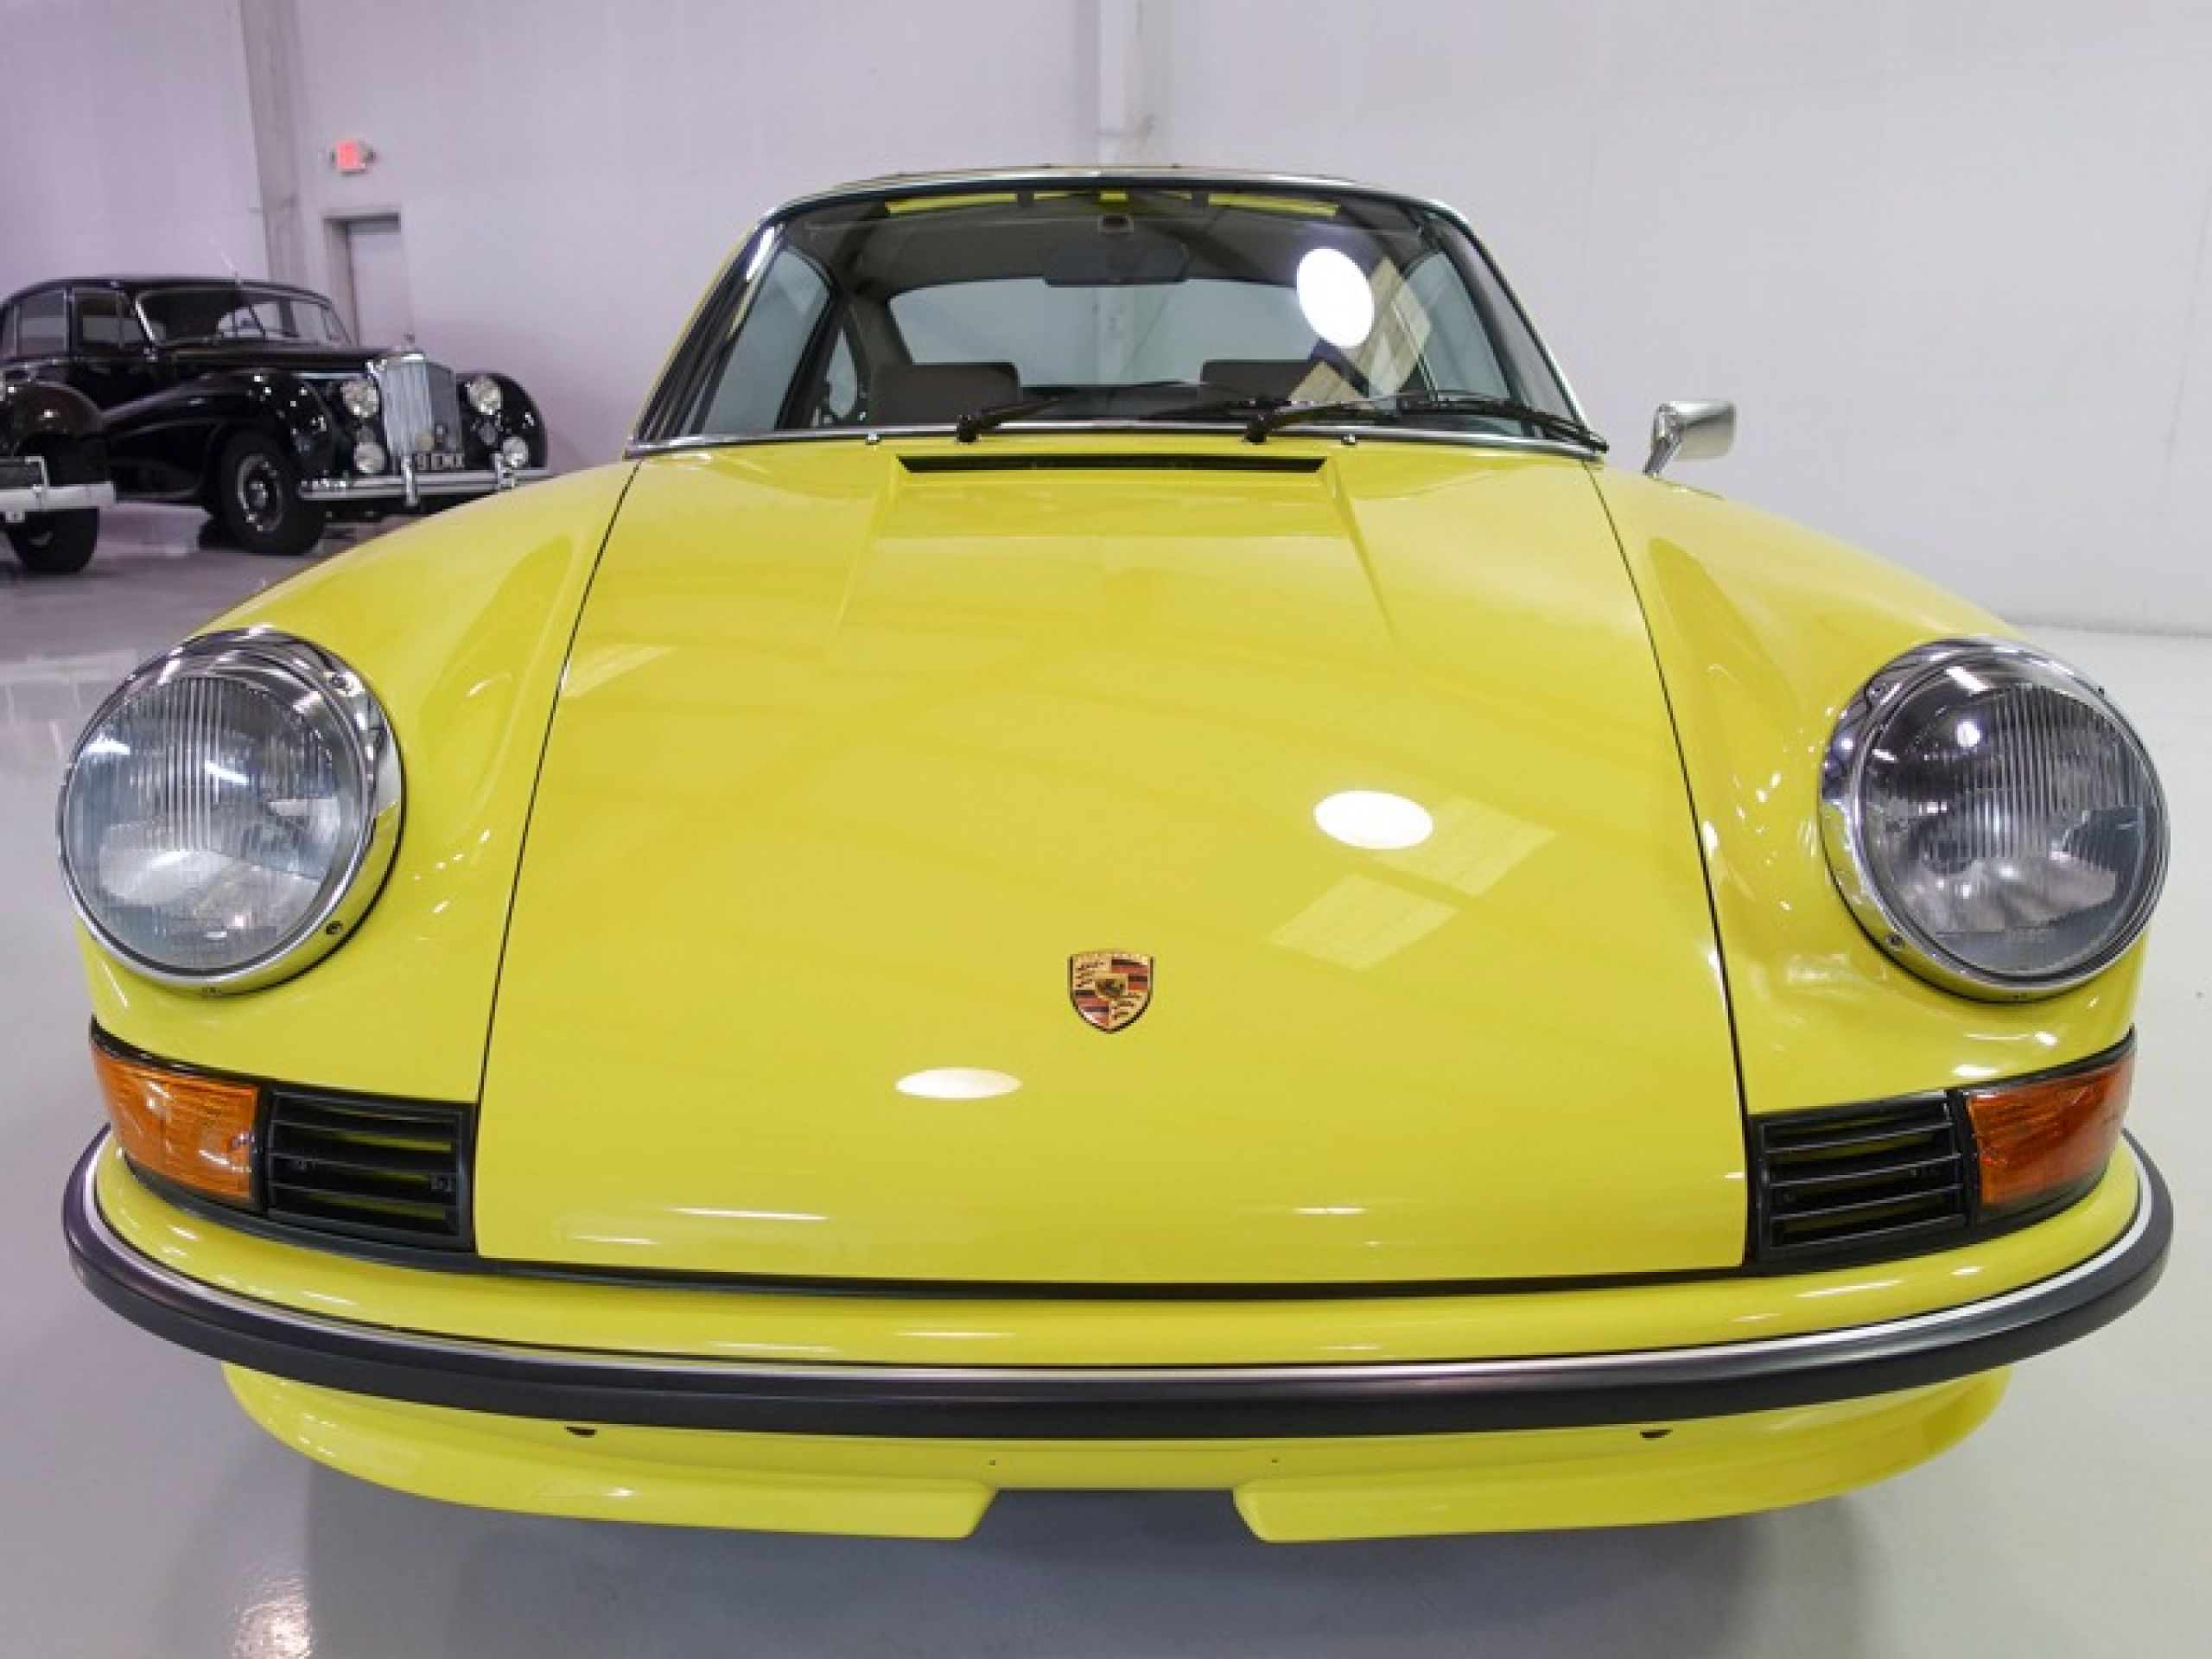 1973 Porsche 911S Sunroof Coupe